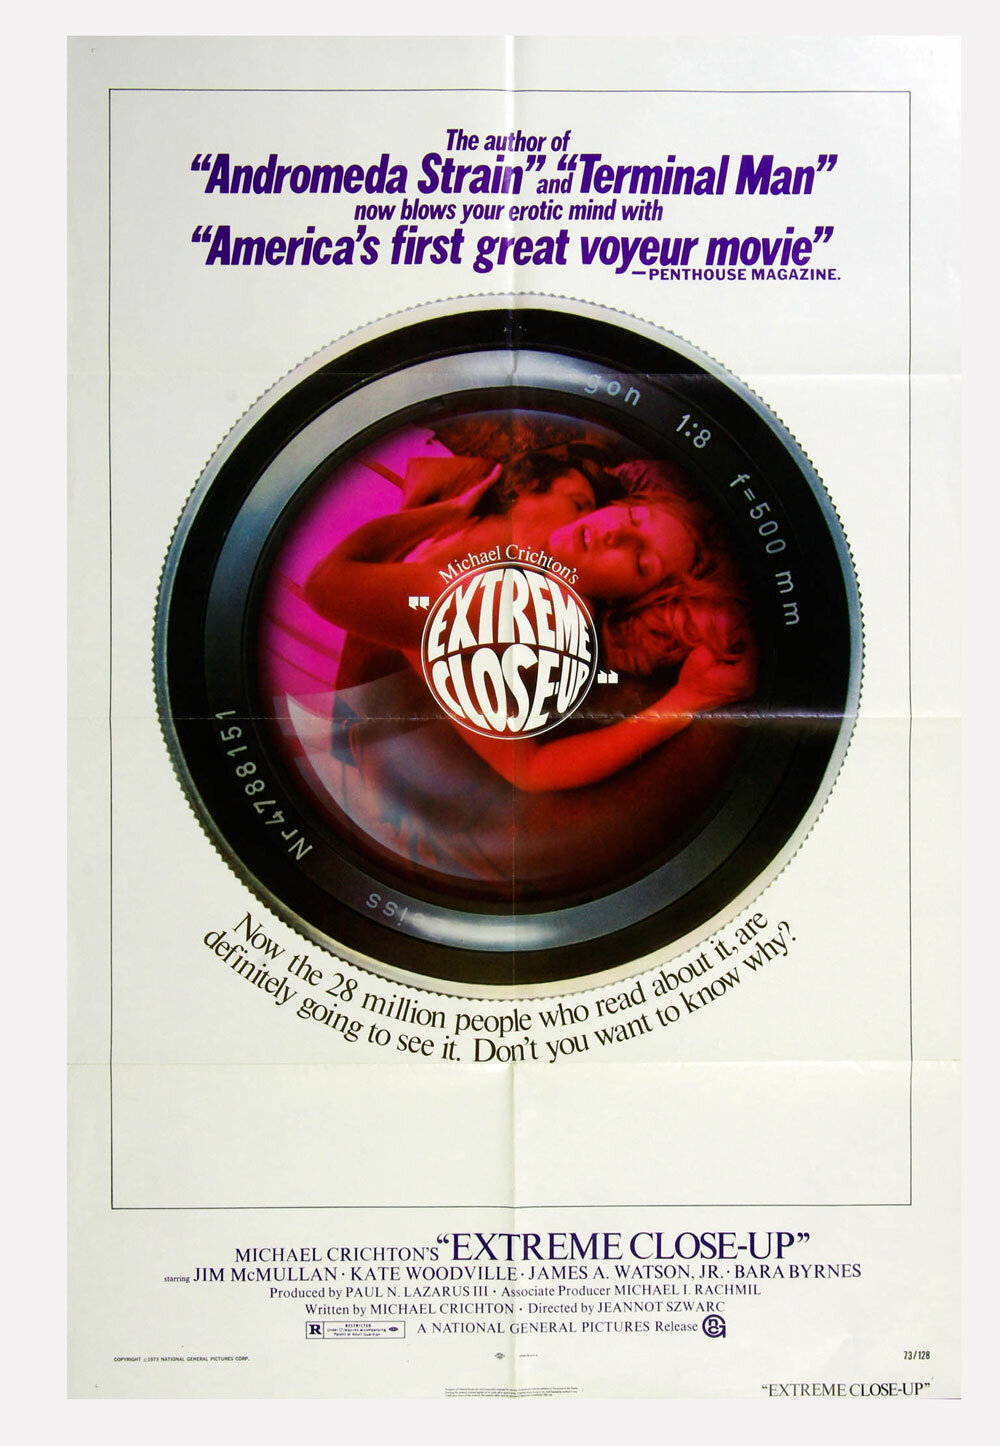 Extreme Close Up Movie Poster 1973 Jim McMullan 27 x 41